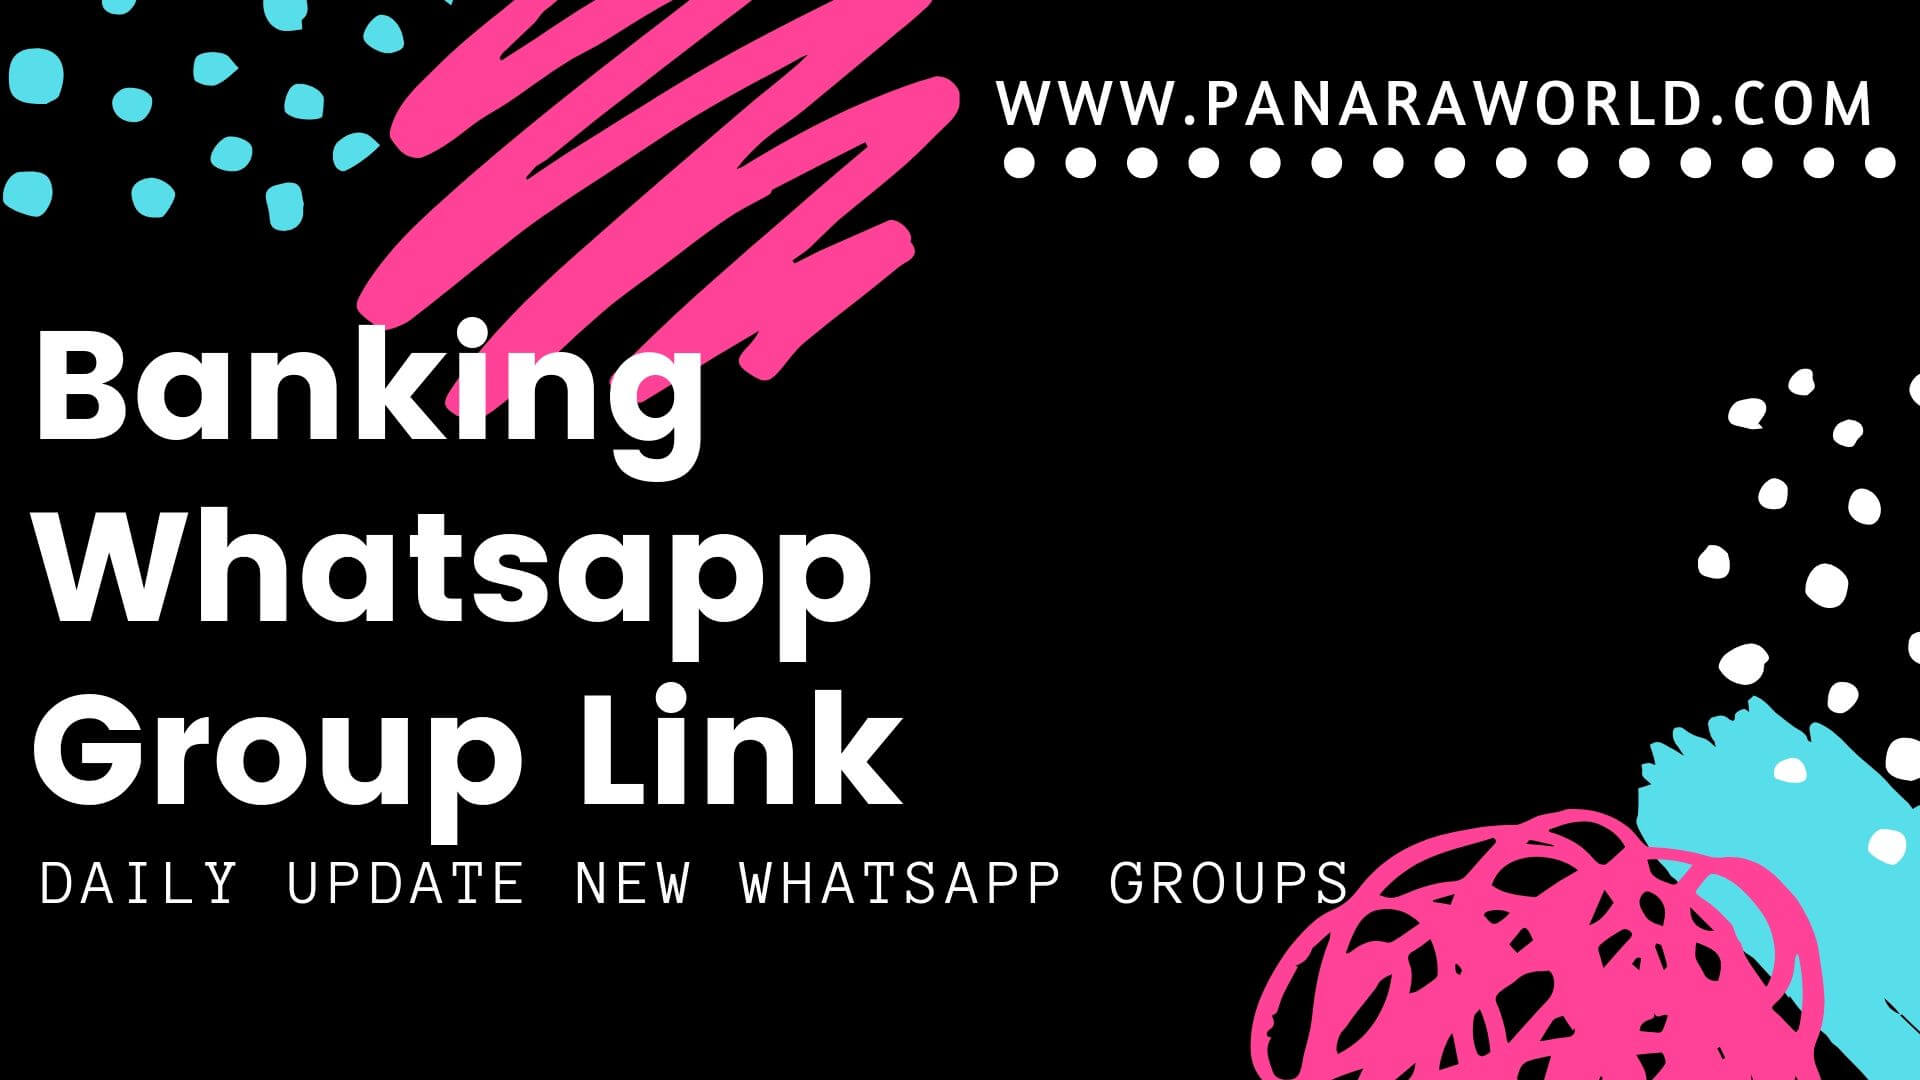 Banking Whatsapp Group Link